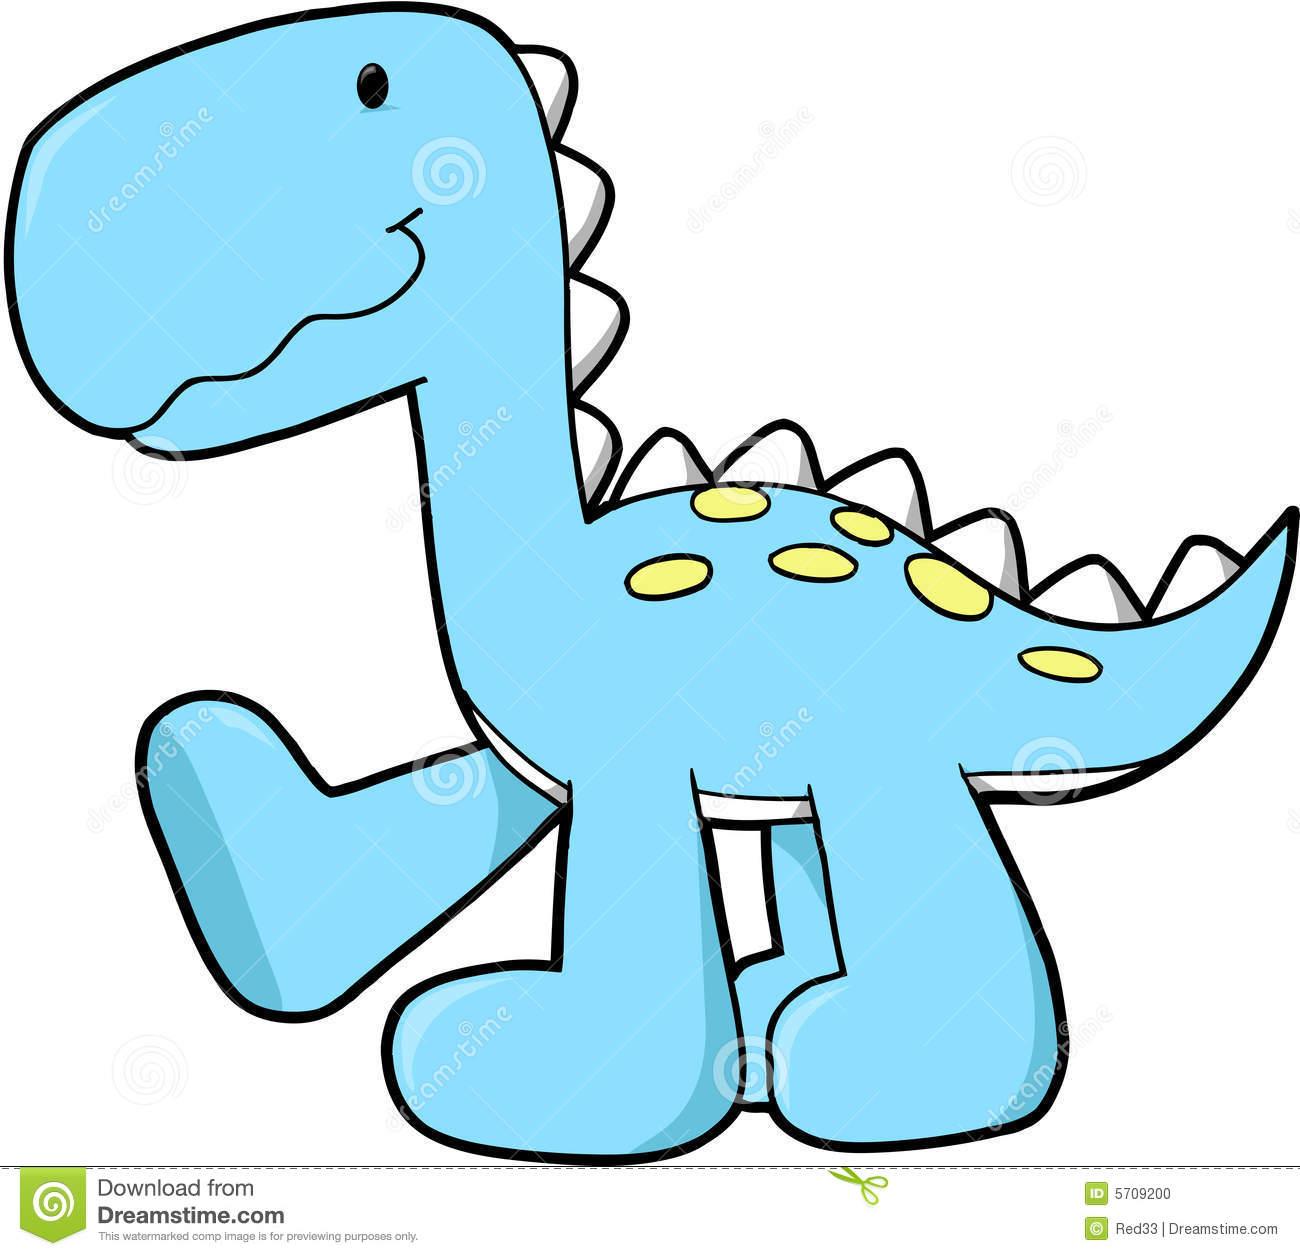 cute dinosaur clipart clipart panda free clipart images rh clipartpanda com free clipart dinosaur bones free dinosaur clipart for teachers